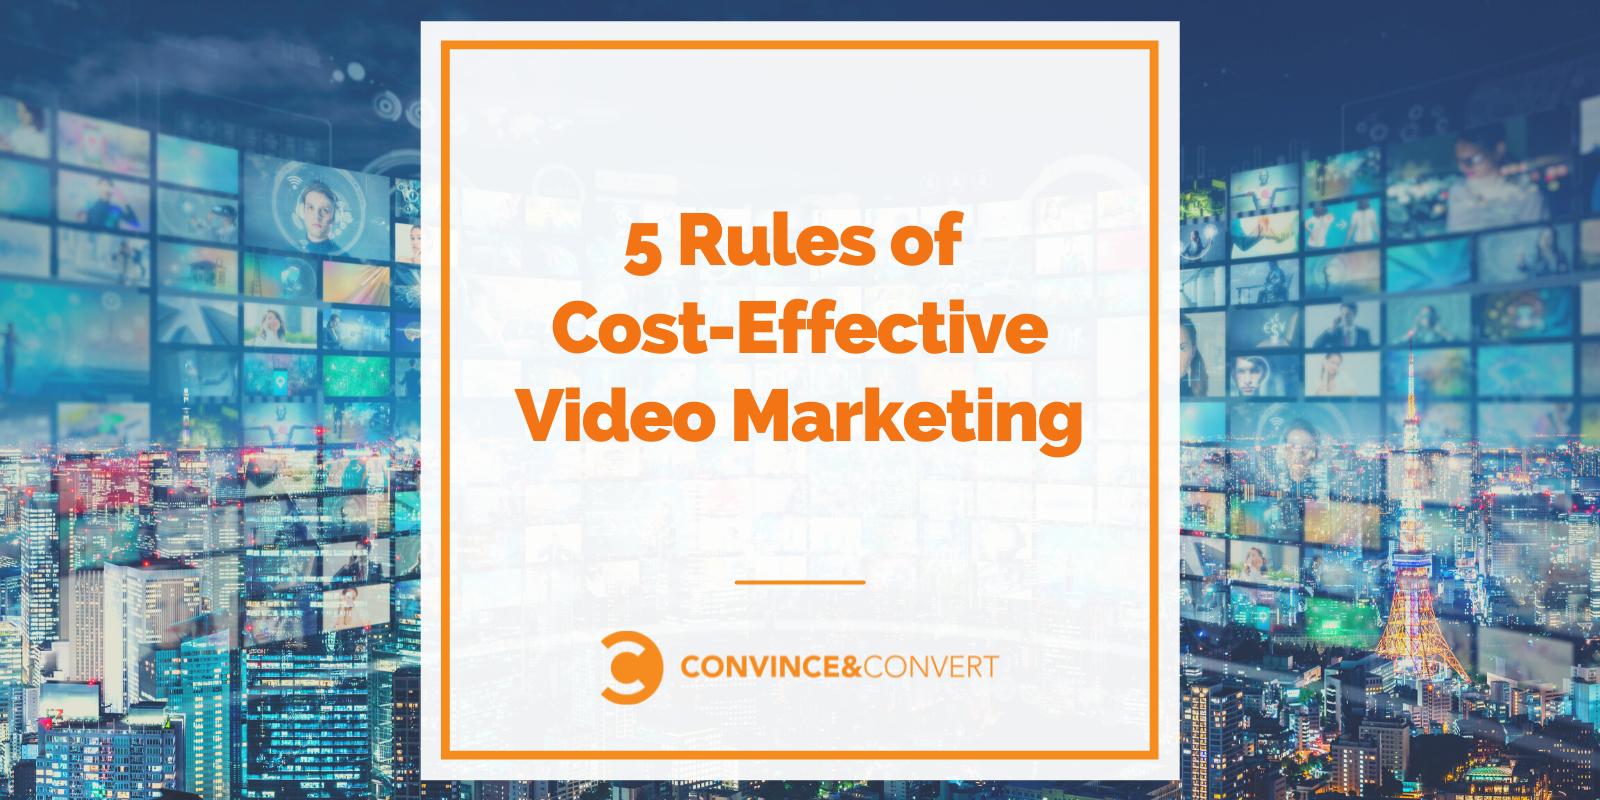 5 Principles of Price-Efficient Video Advertising